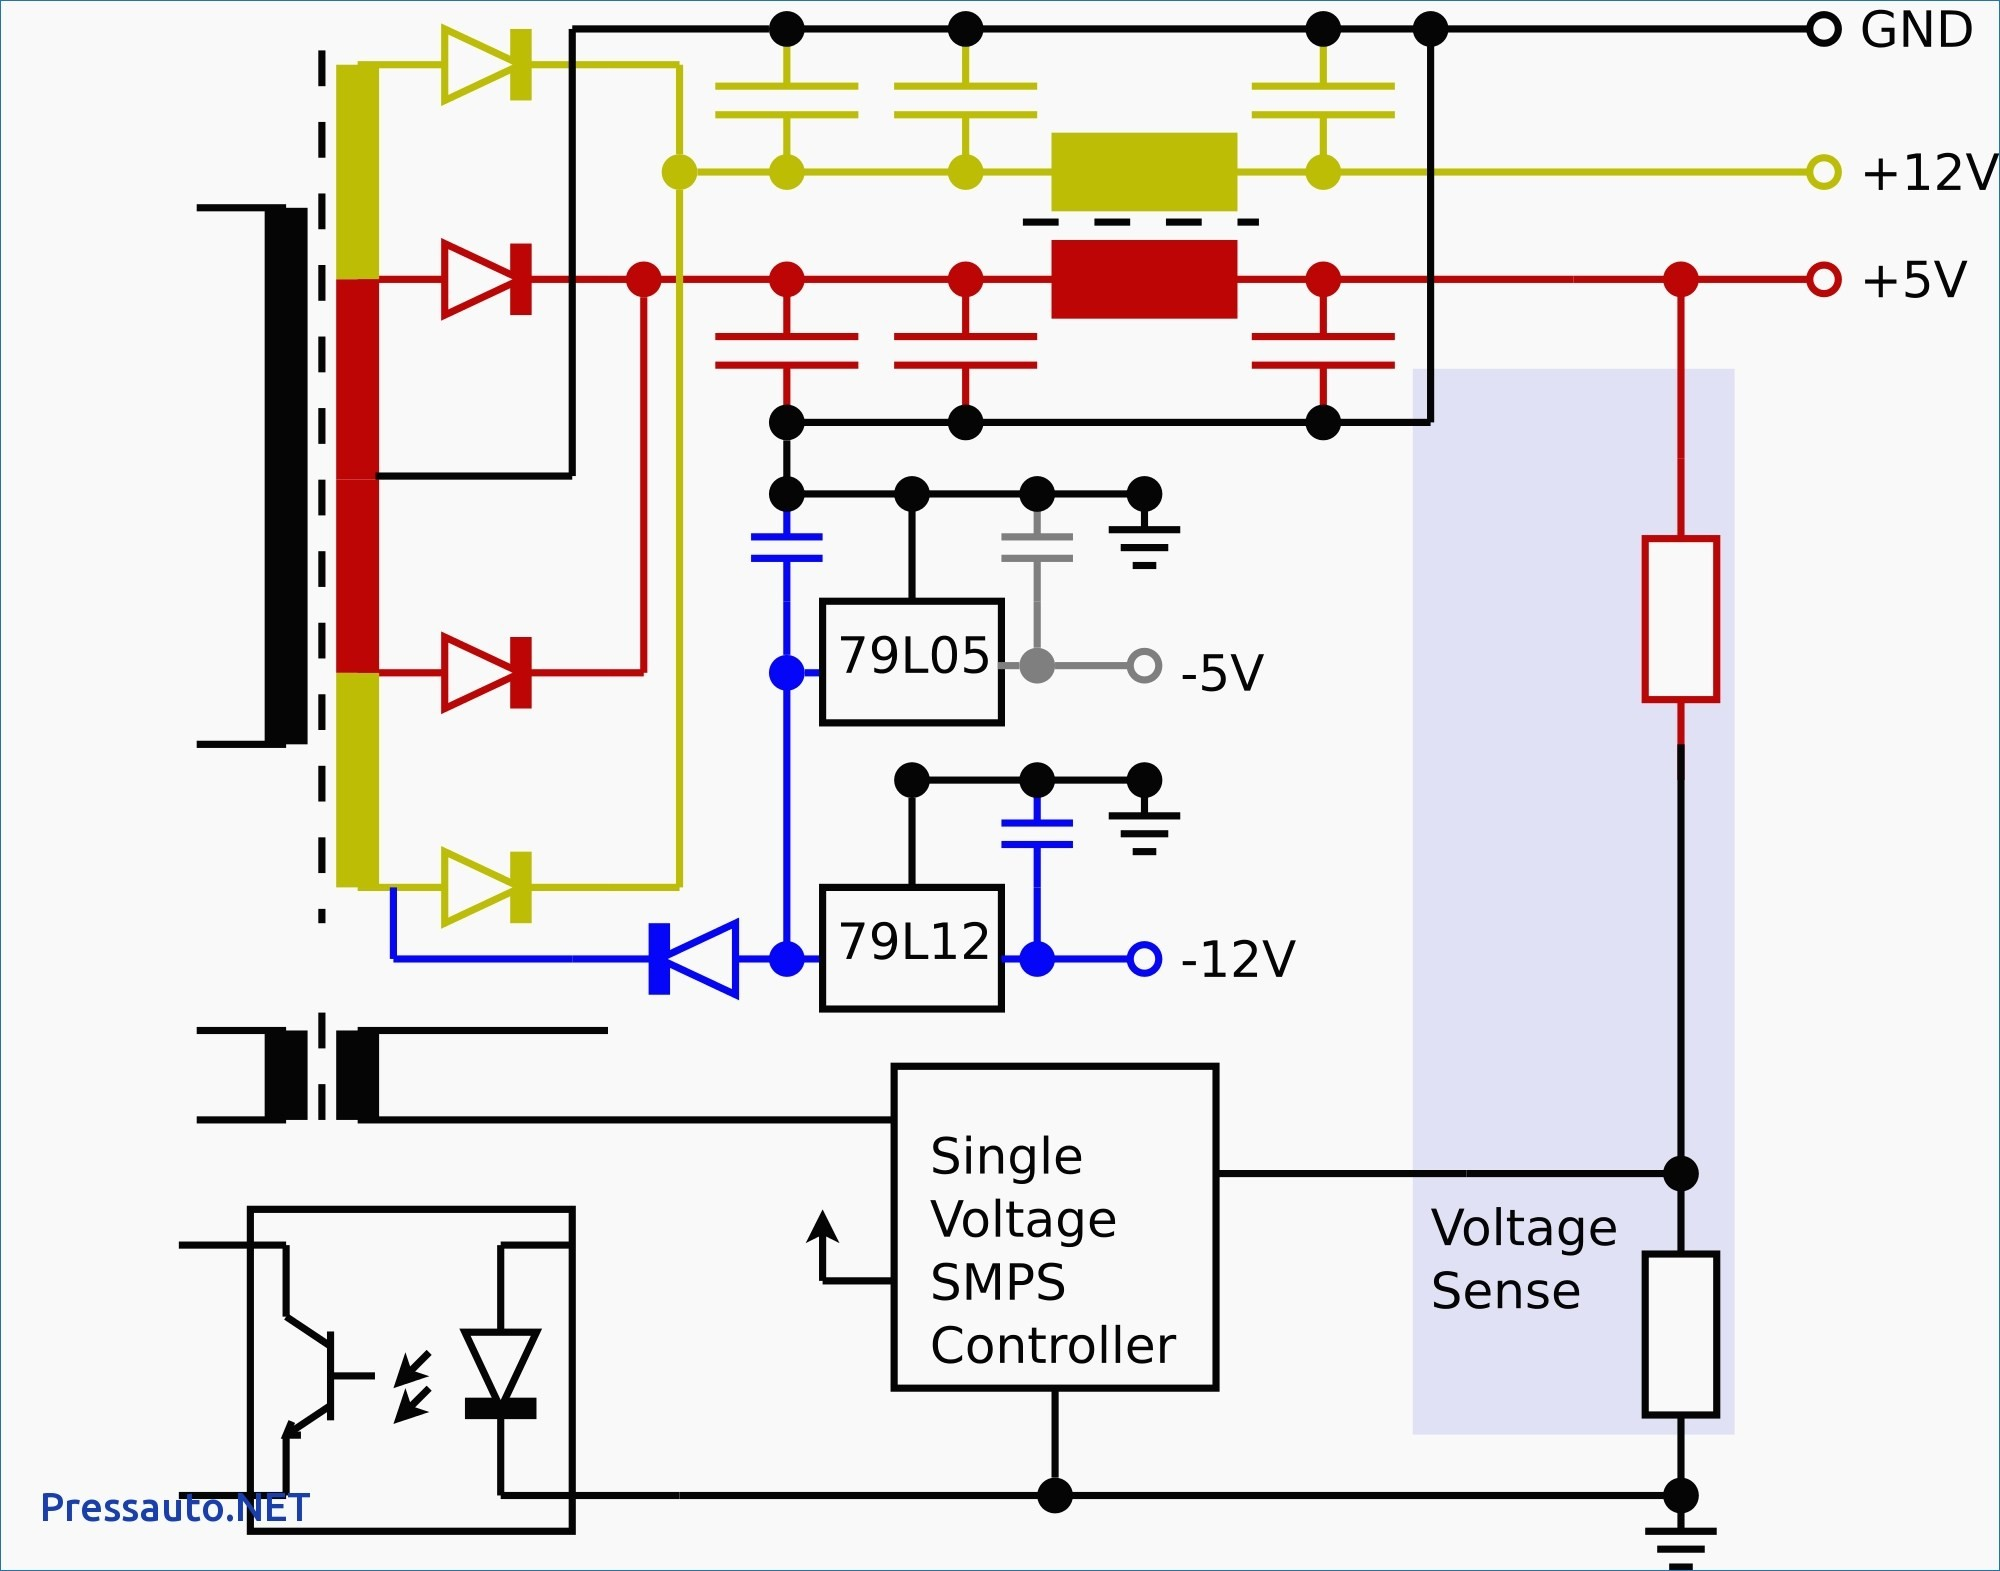 hight resolution of 24 volt ac transformer wiring diagram wiring library12v transformer wiring diagram 12v transformer wiring diagram tearing